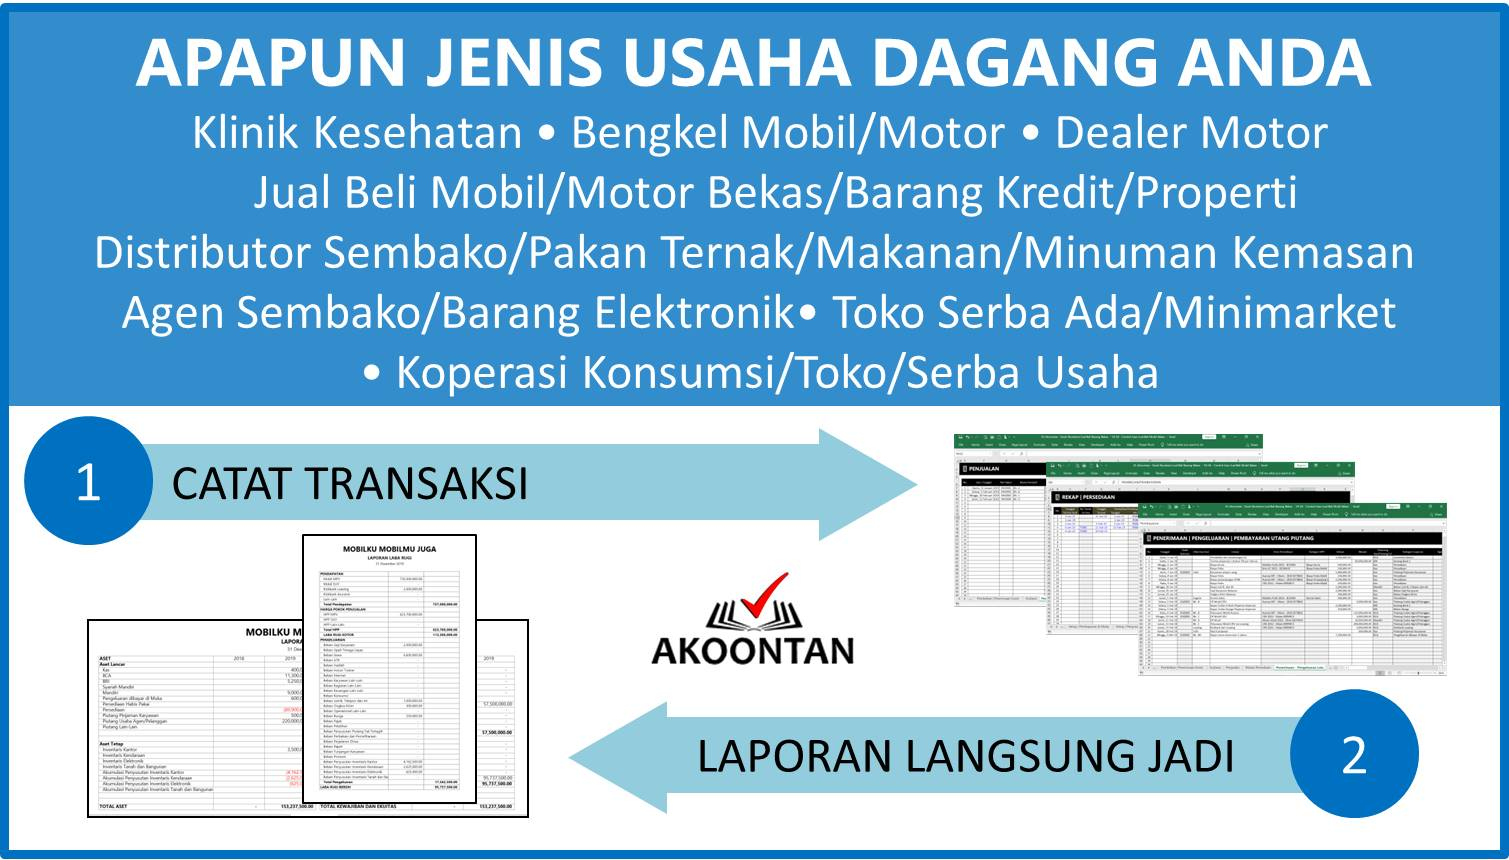 Aplikasi Akuntansi Awam untuk Perusahaan Dagang